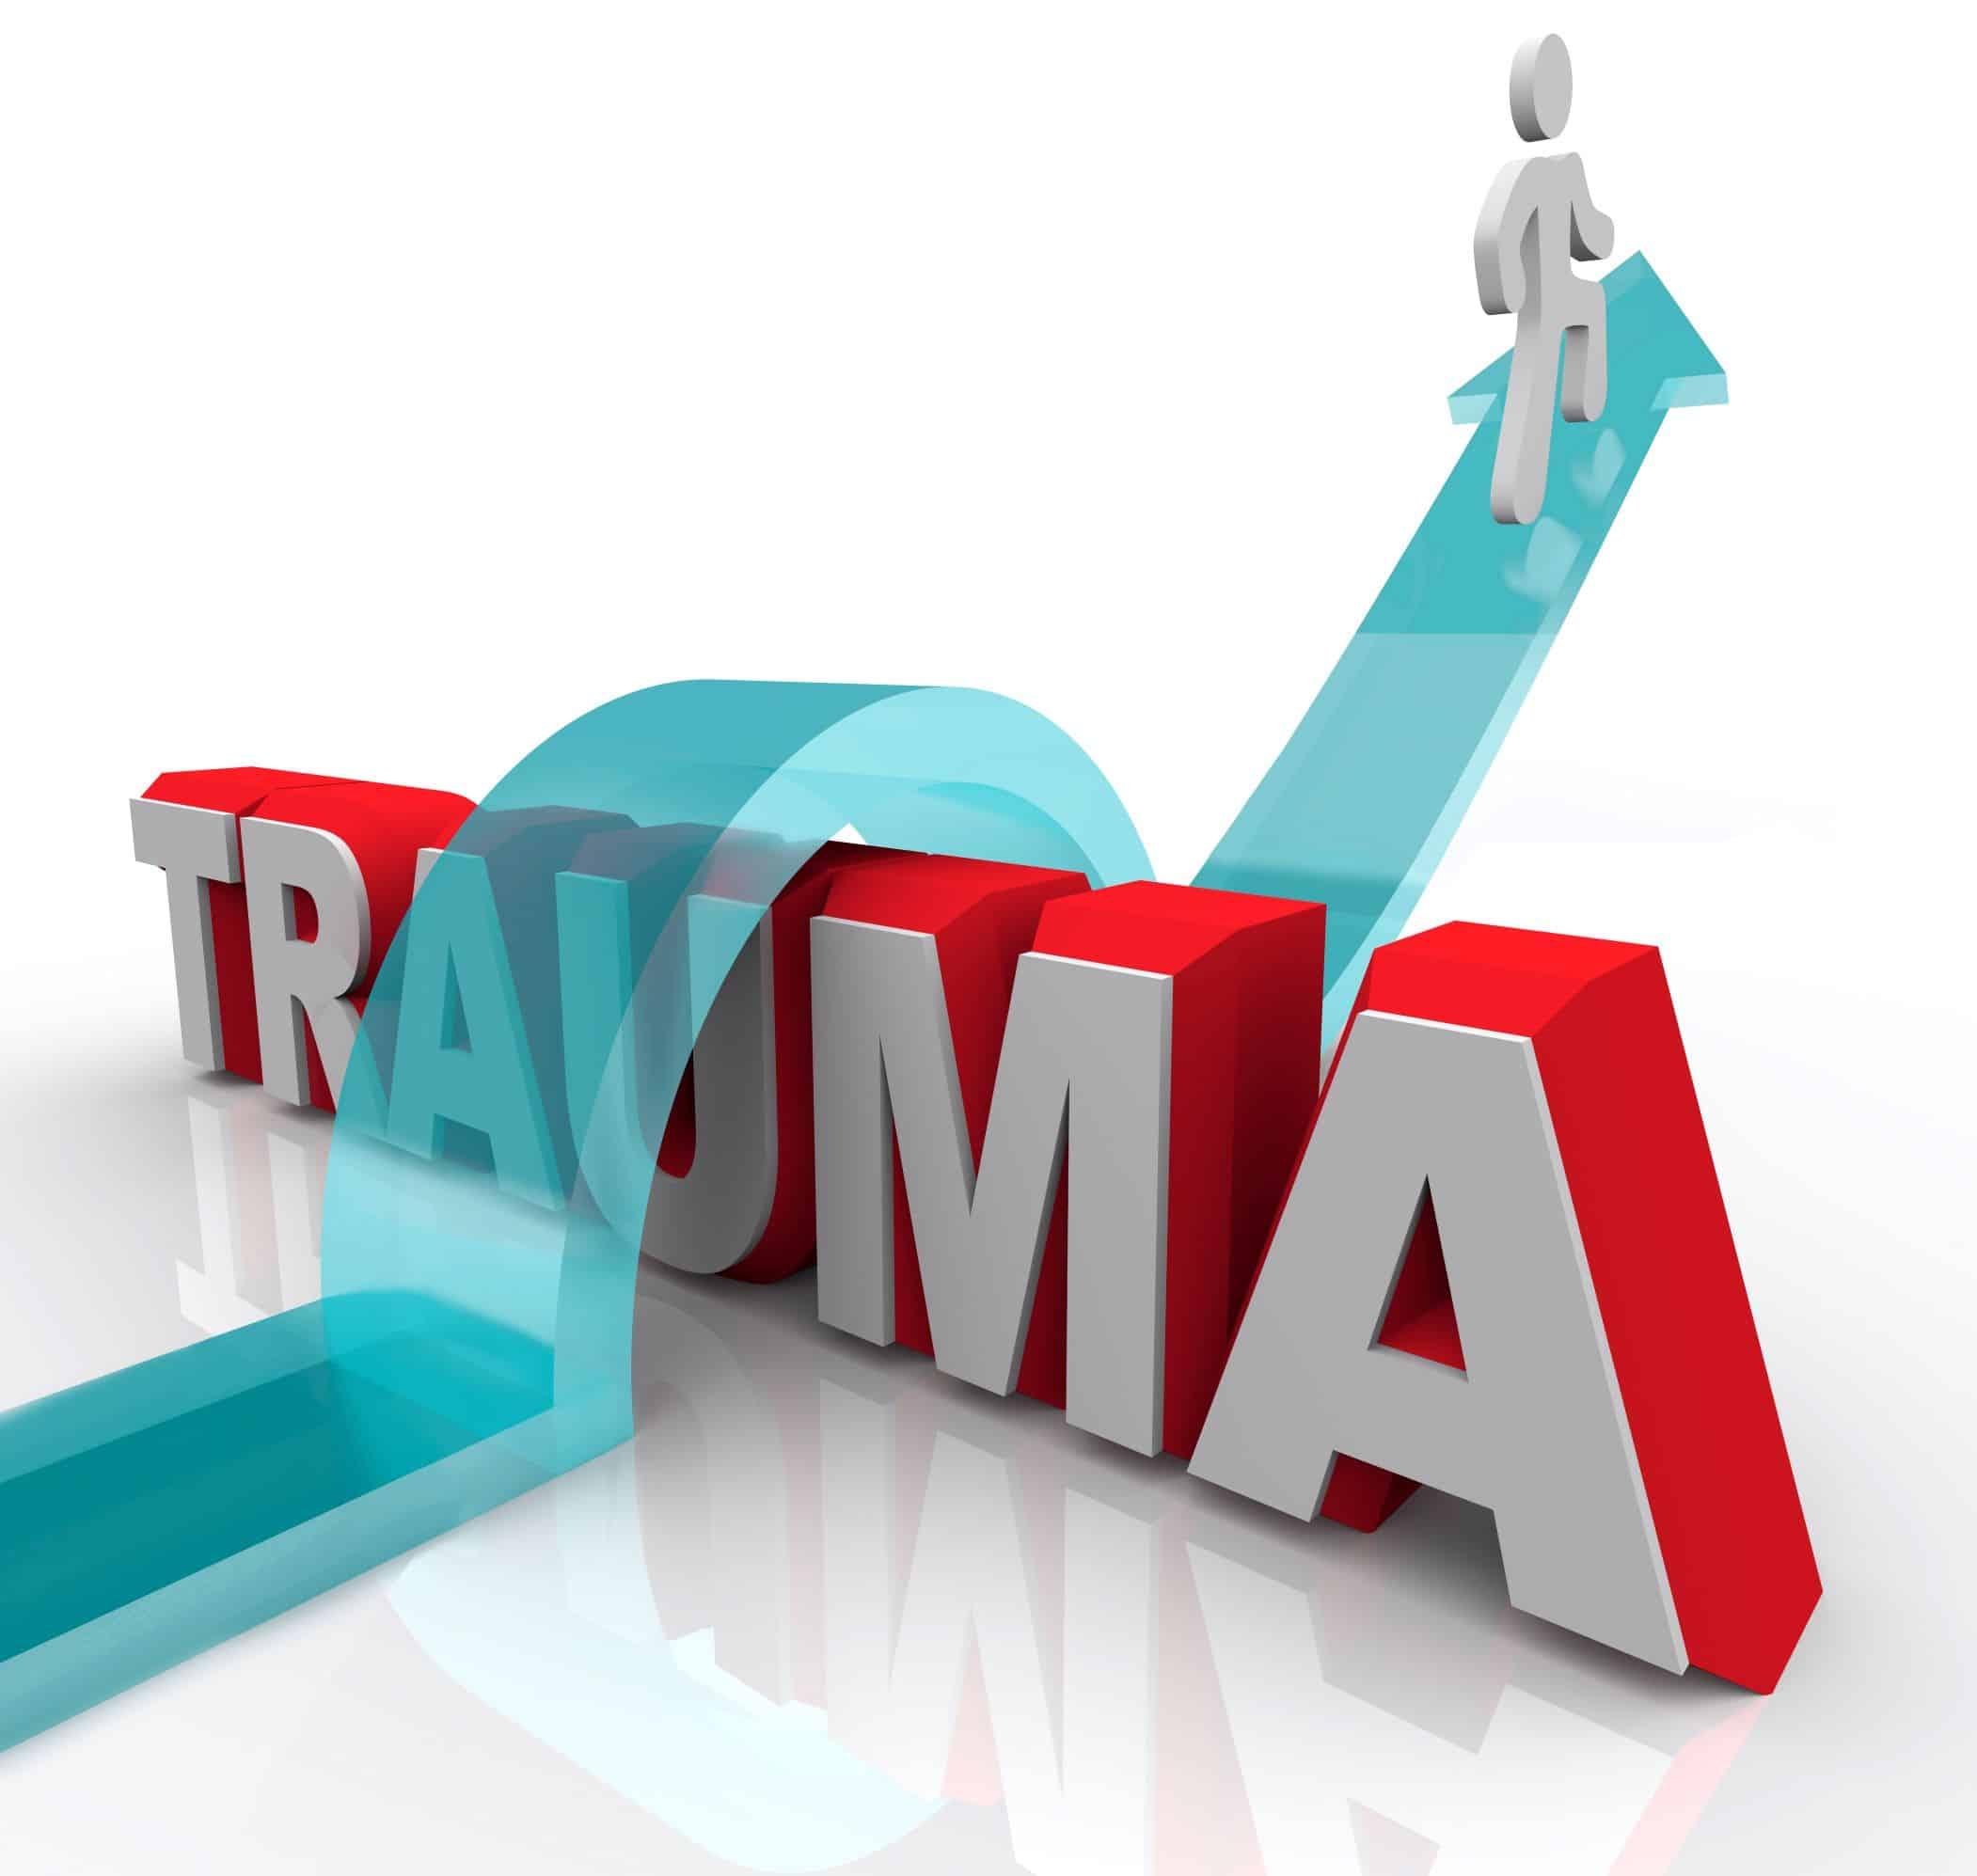 Trauma - business results - pm